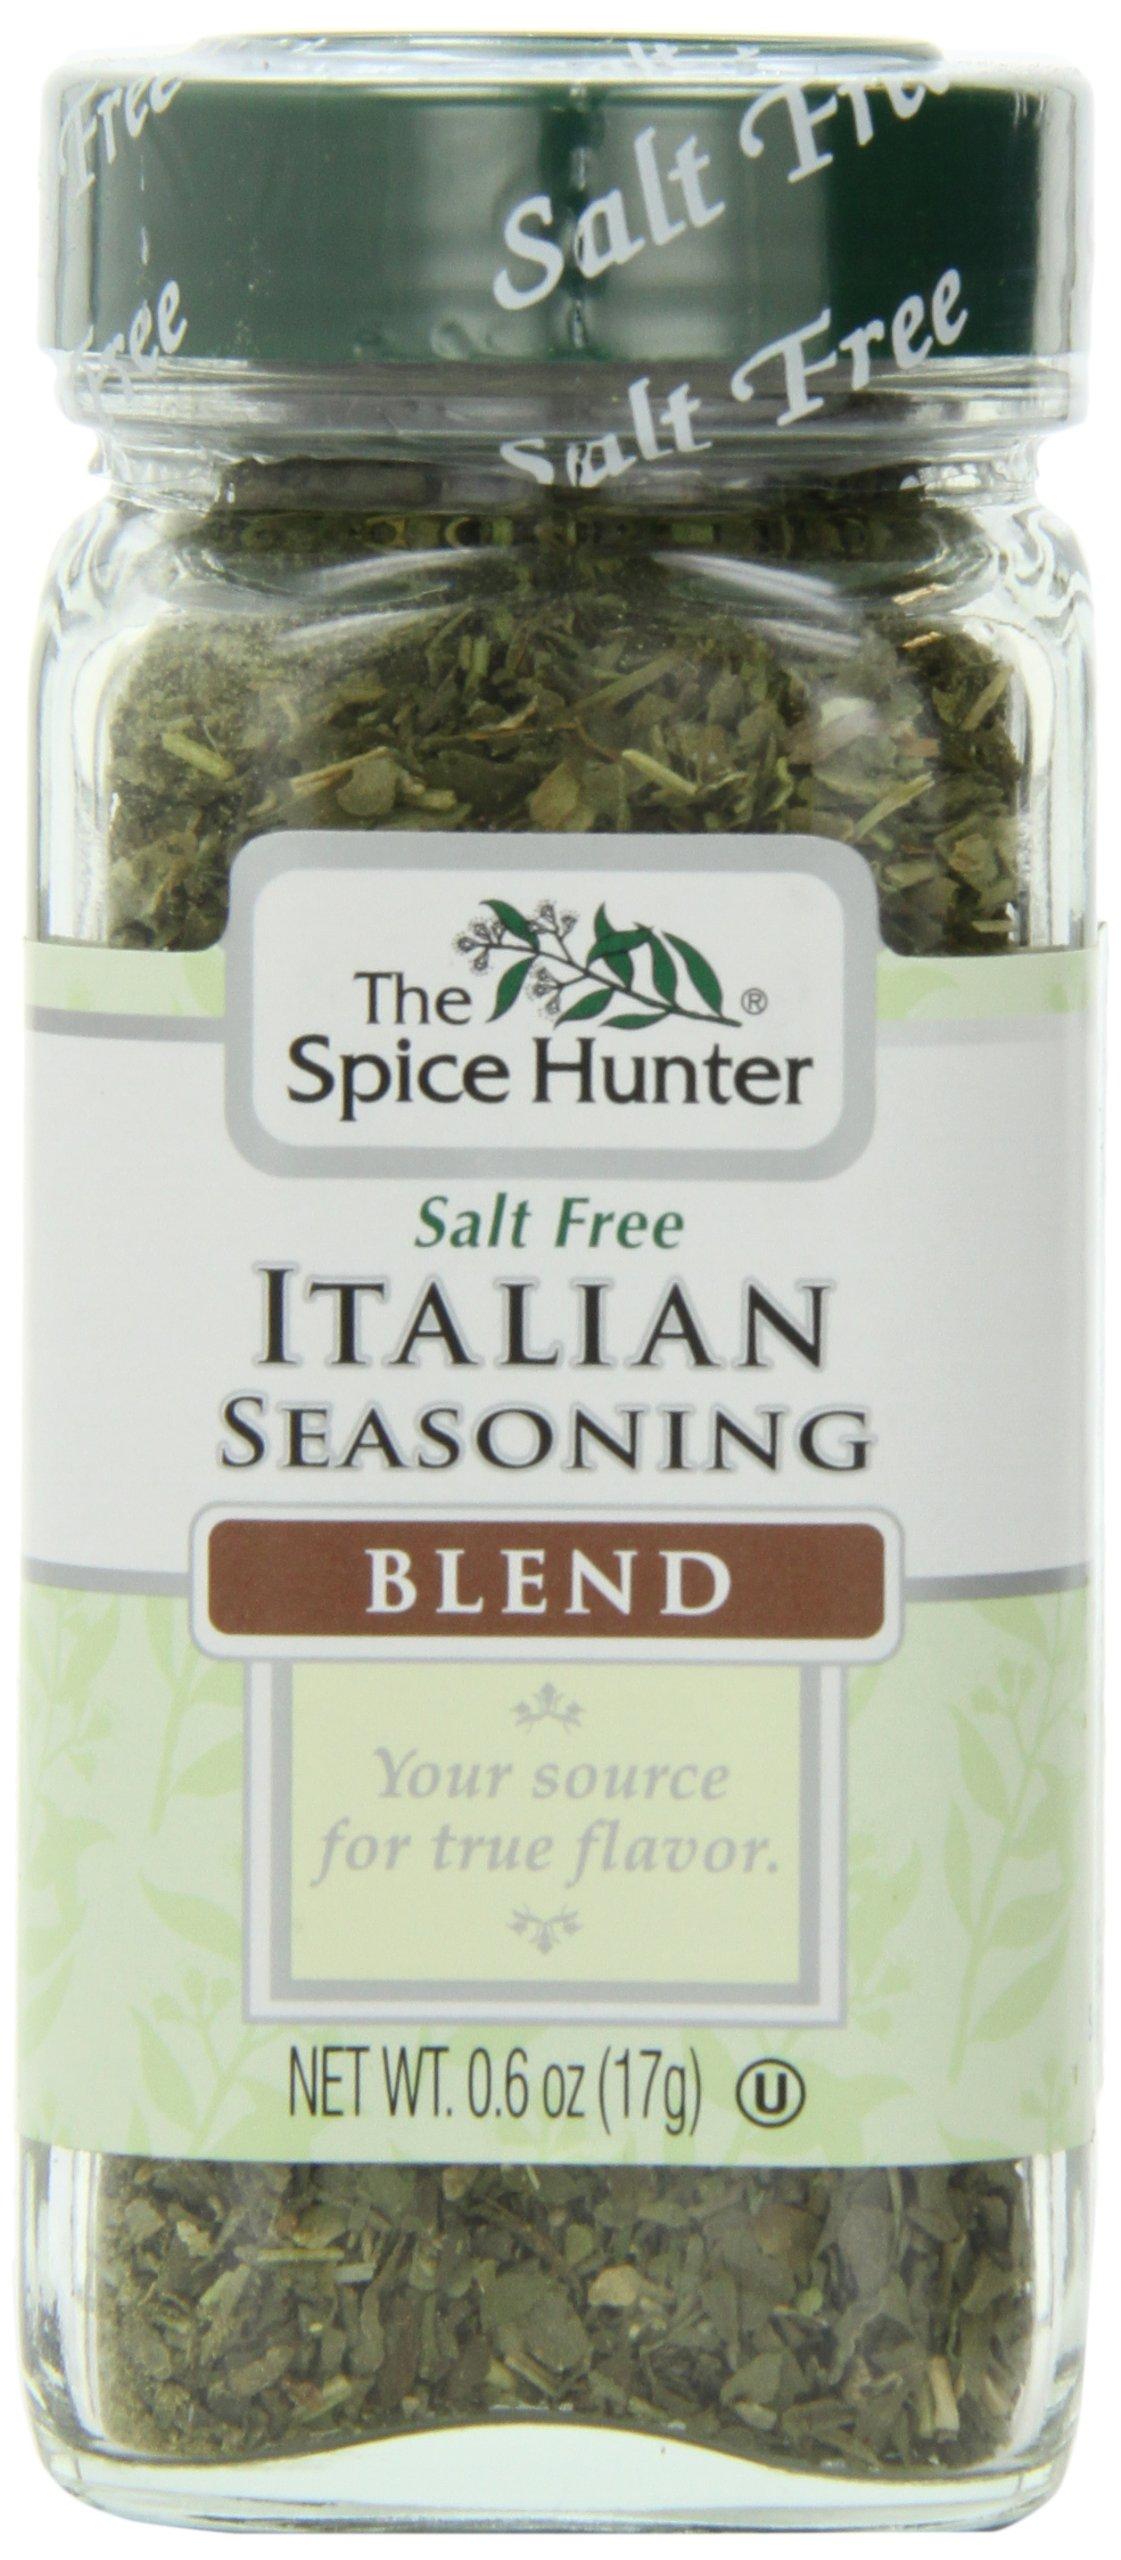 The Spice Hunter Italian Seasoning Blend, 0.6-Ounce Jar